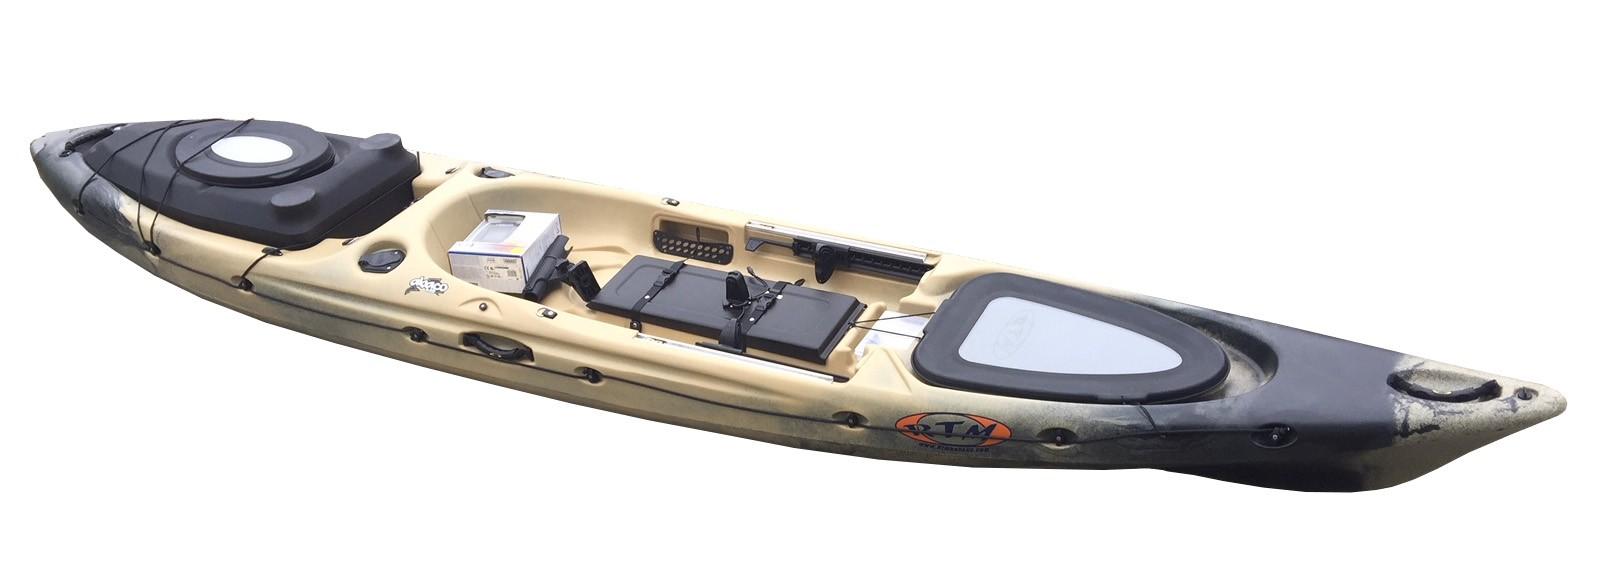 Kayak RTM Abaco 420 Luxe + Hitech Sondeur X4 (Marbre)